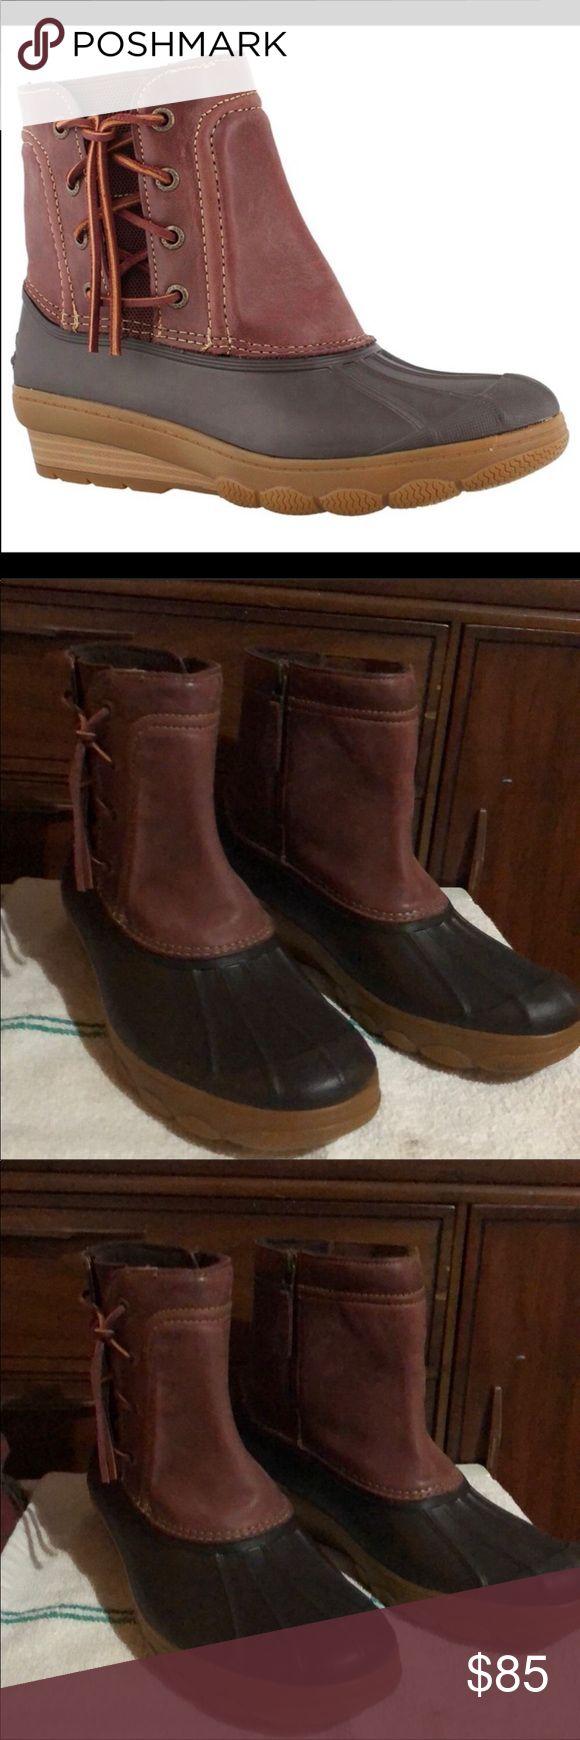 Nwot Sperry Saltwater Duck Rain Snow Boots 11  Boots -8746